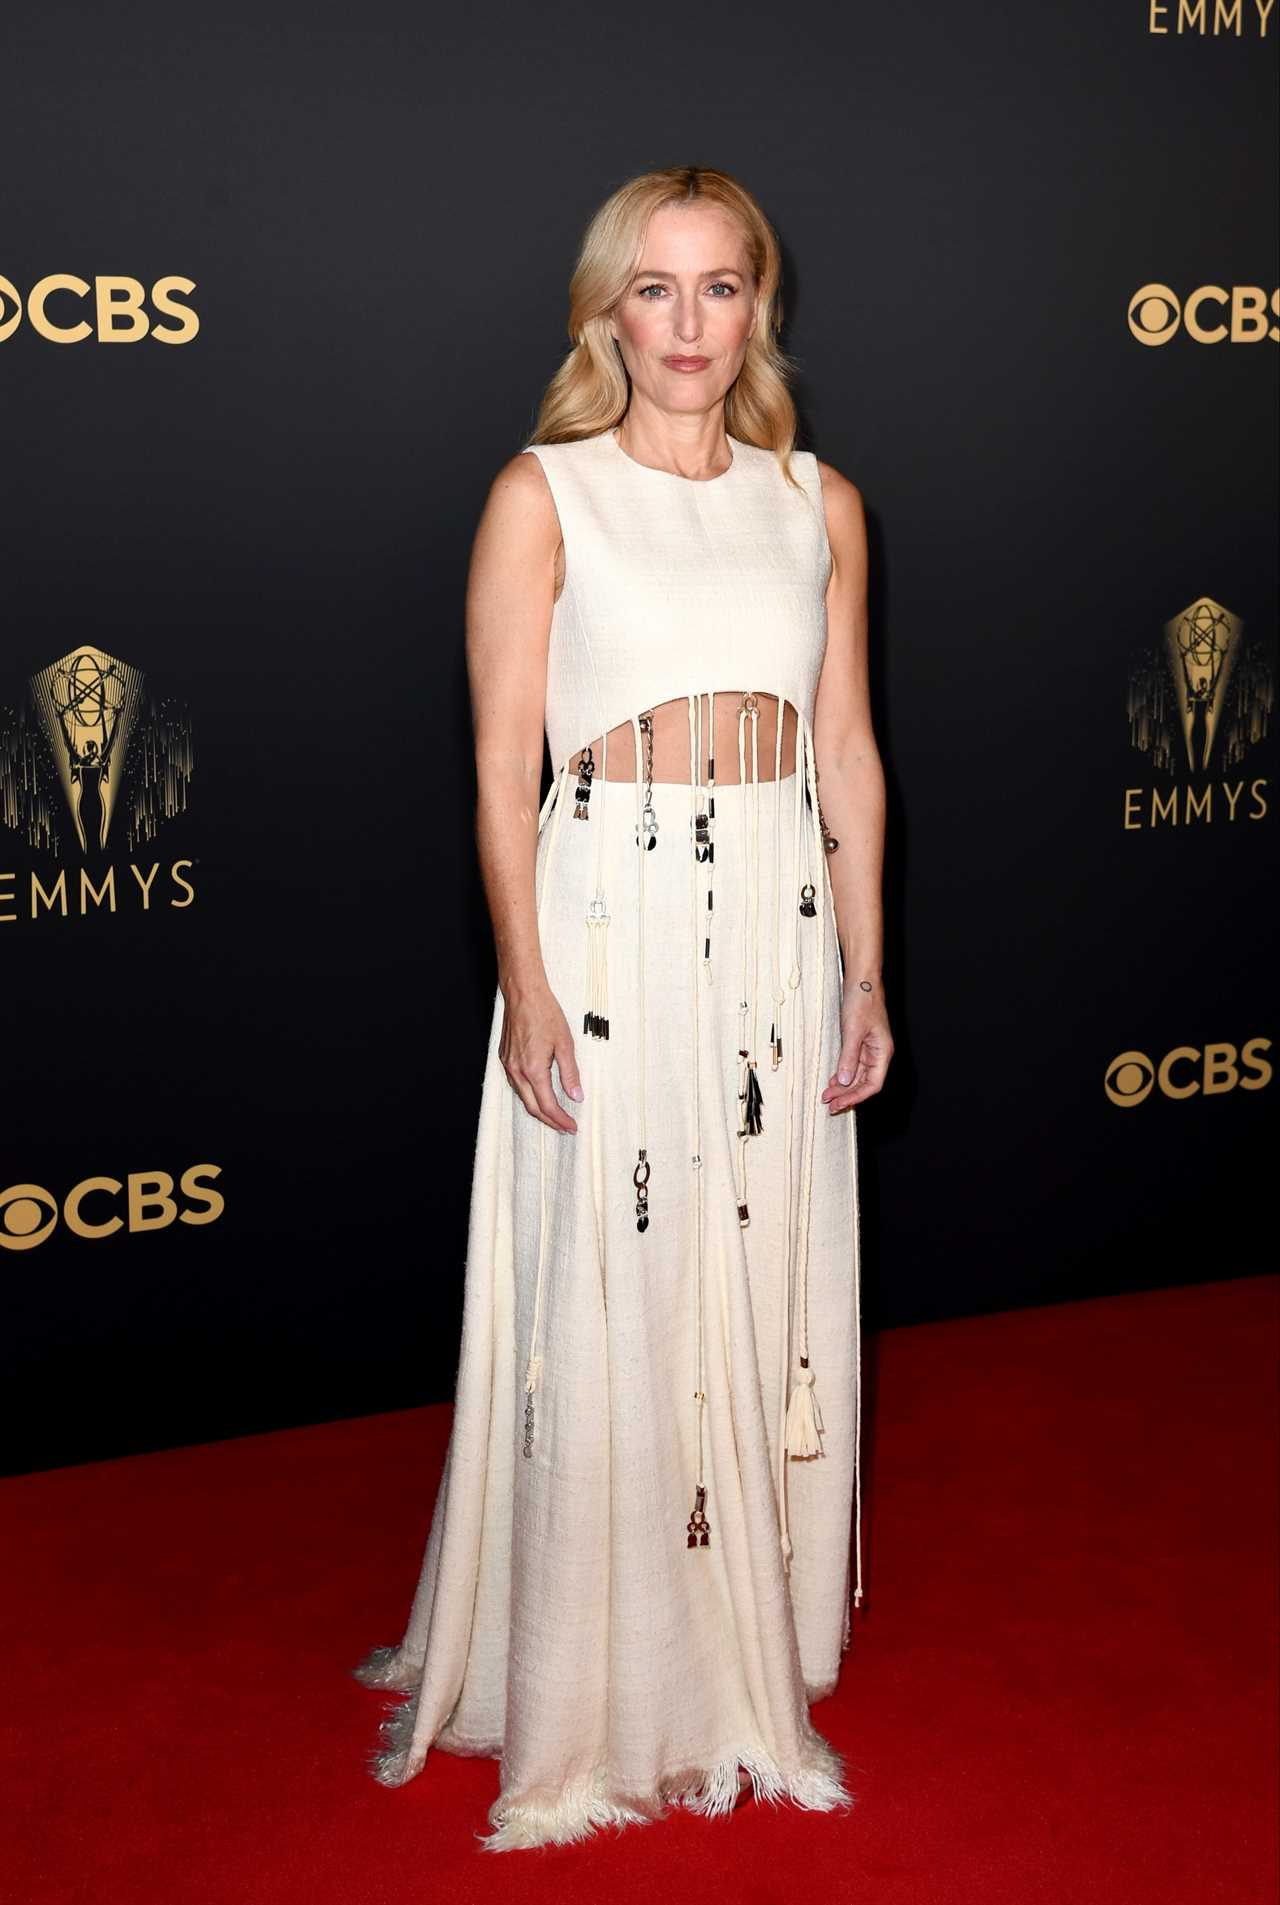 Gillian stunned in a white dress